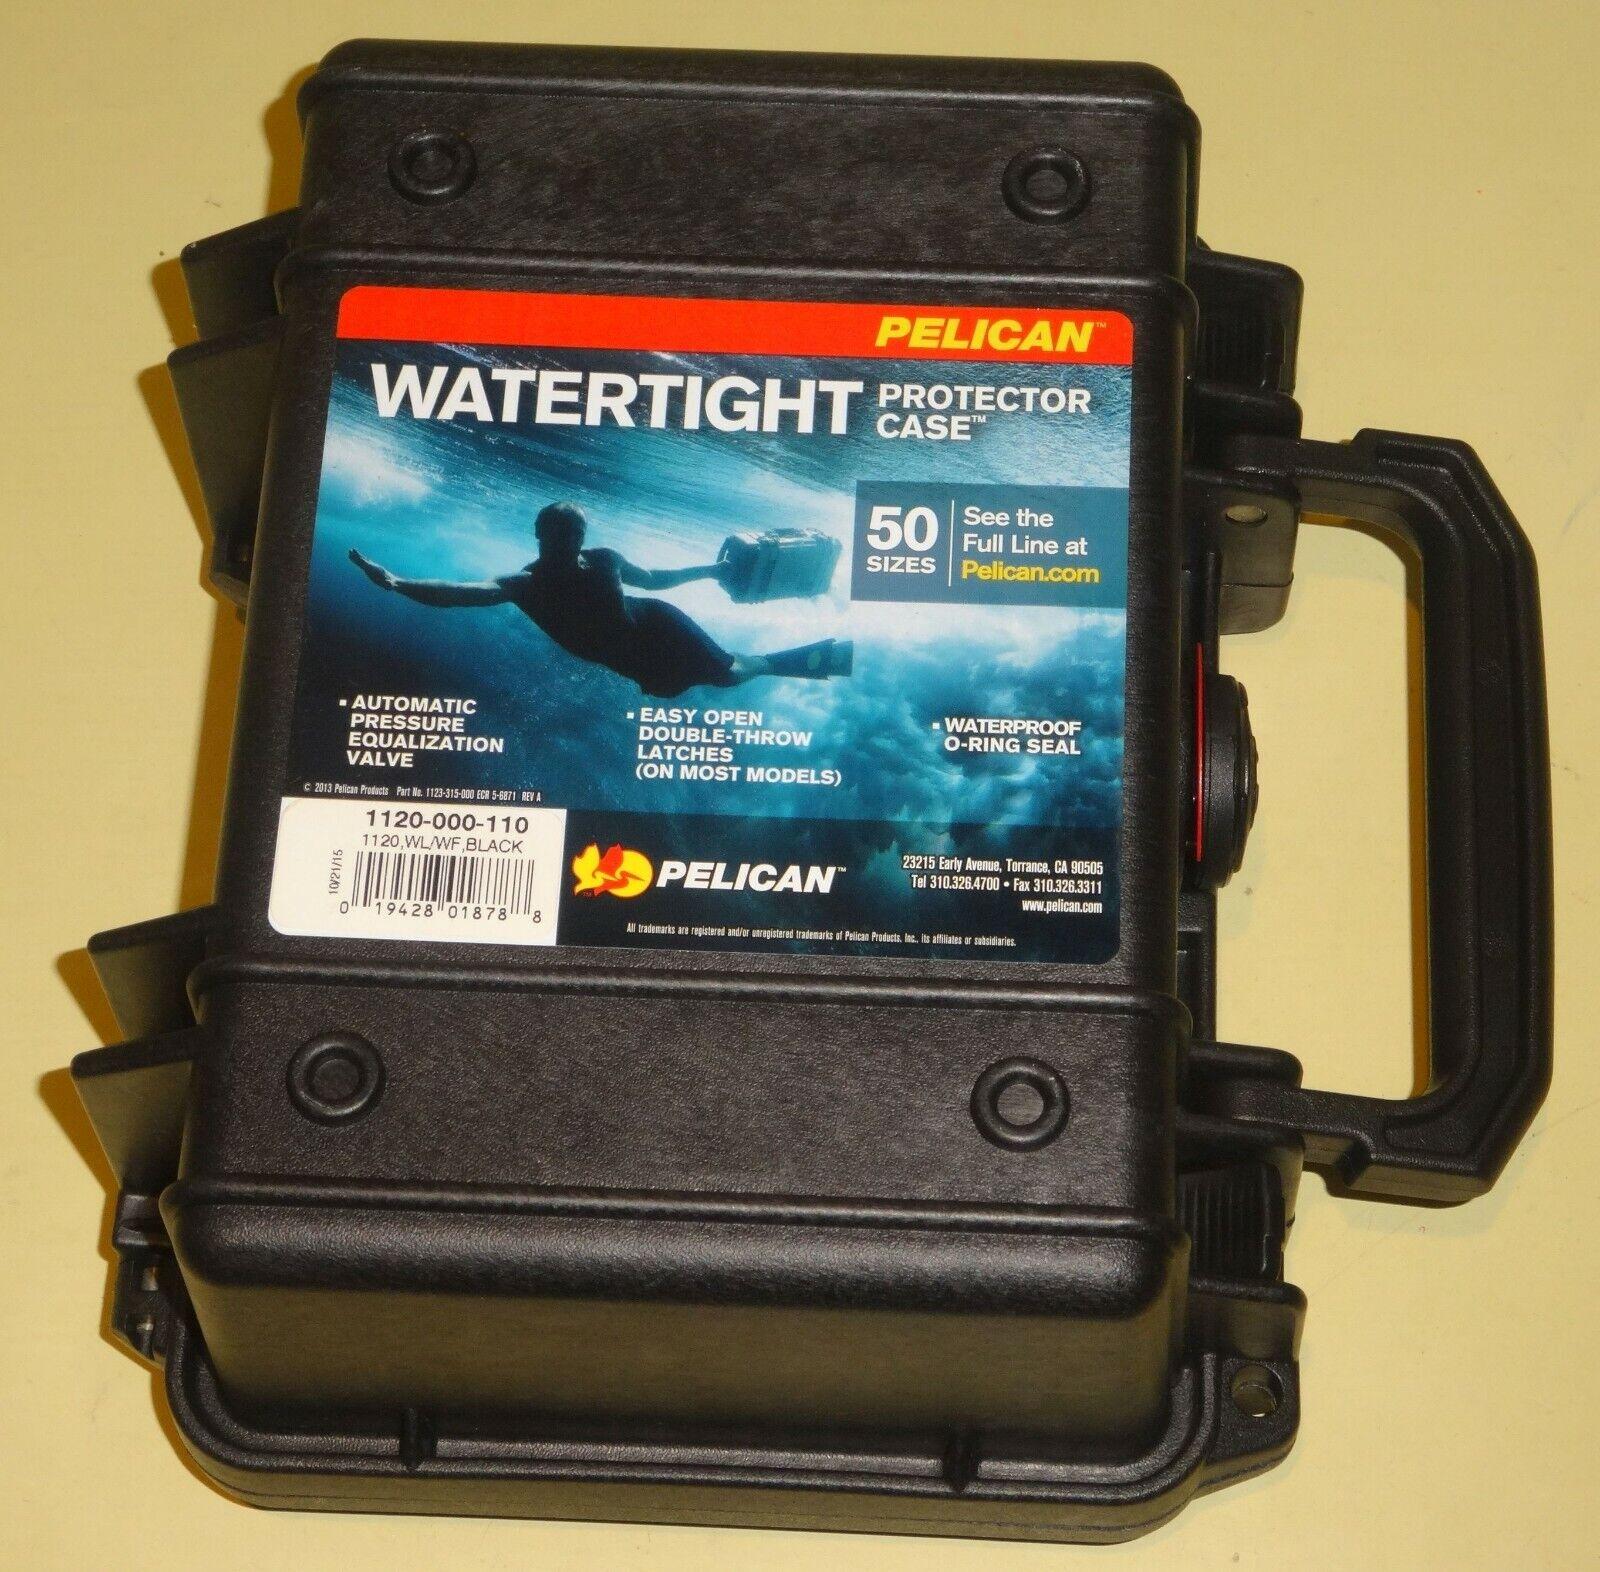 "Equipment Case with Foam: 6.5"" x 8.13"" x 3.5"" Color: Black"